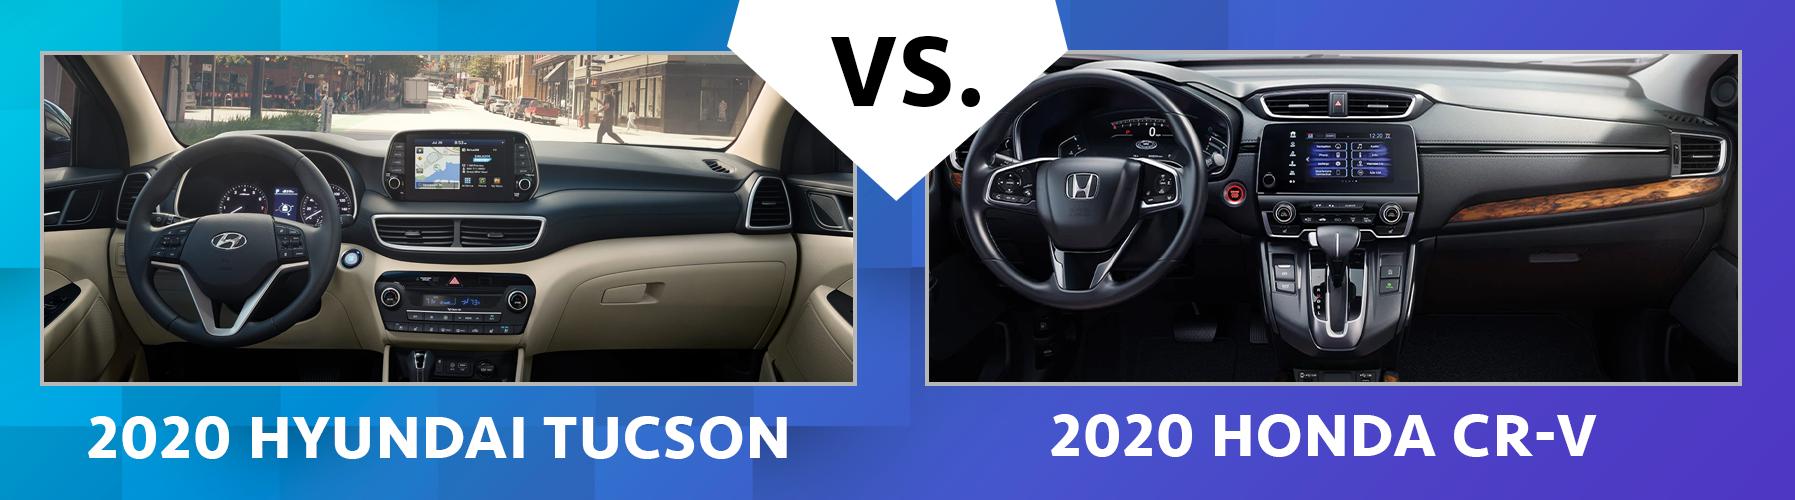 2020 Hyundai Tucson vs 2020 Honda CR-V Safety Features